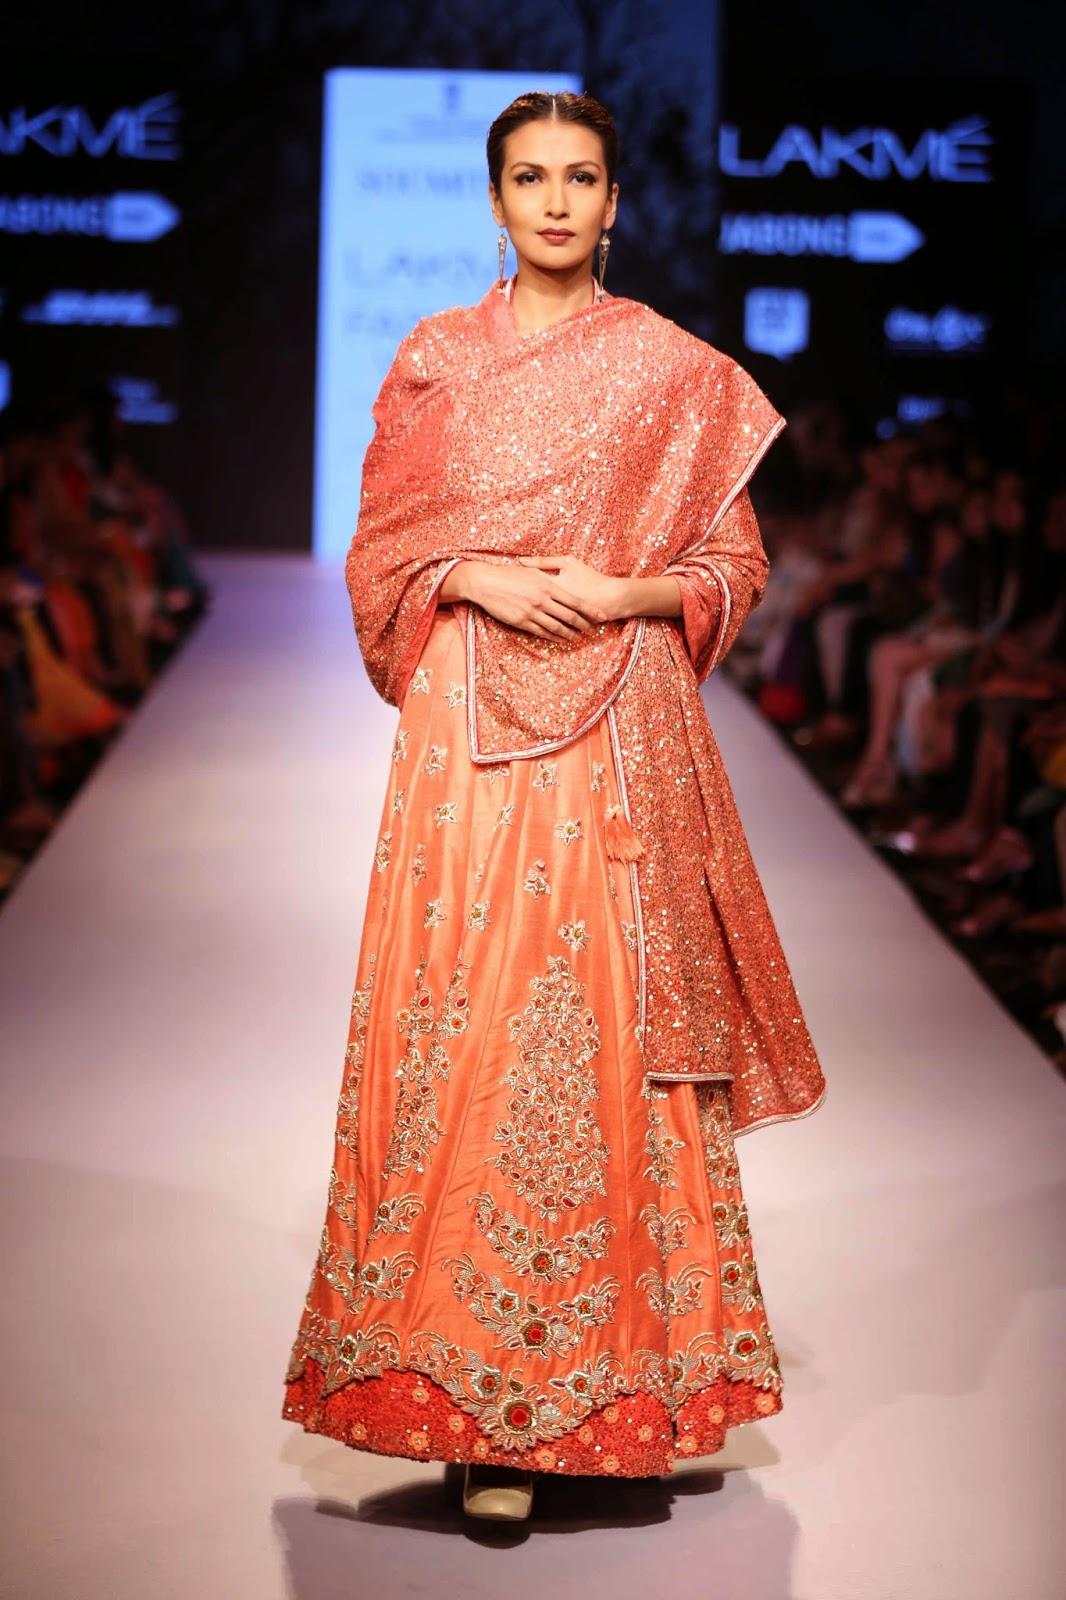 http://aquaintperspective.blogspot.in/,LIFW Day 2, Soumitra Mondal